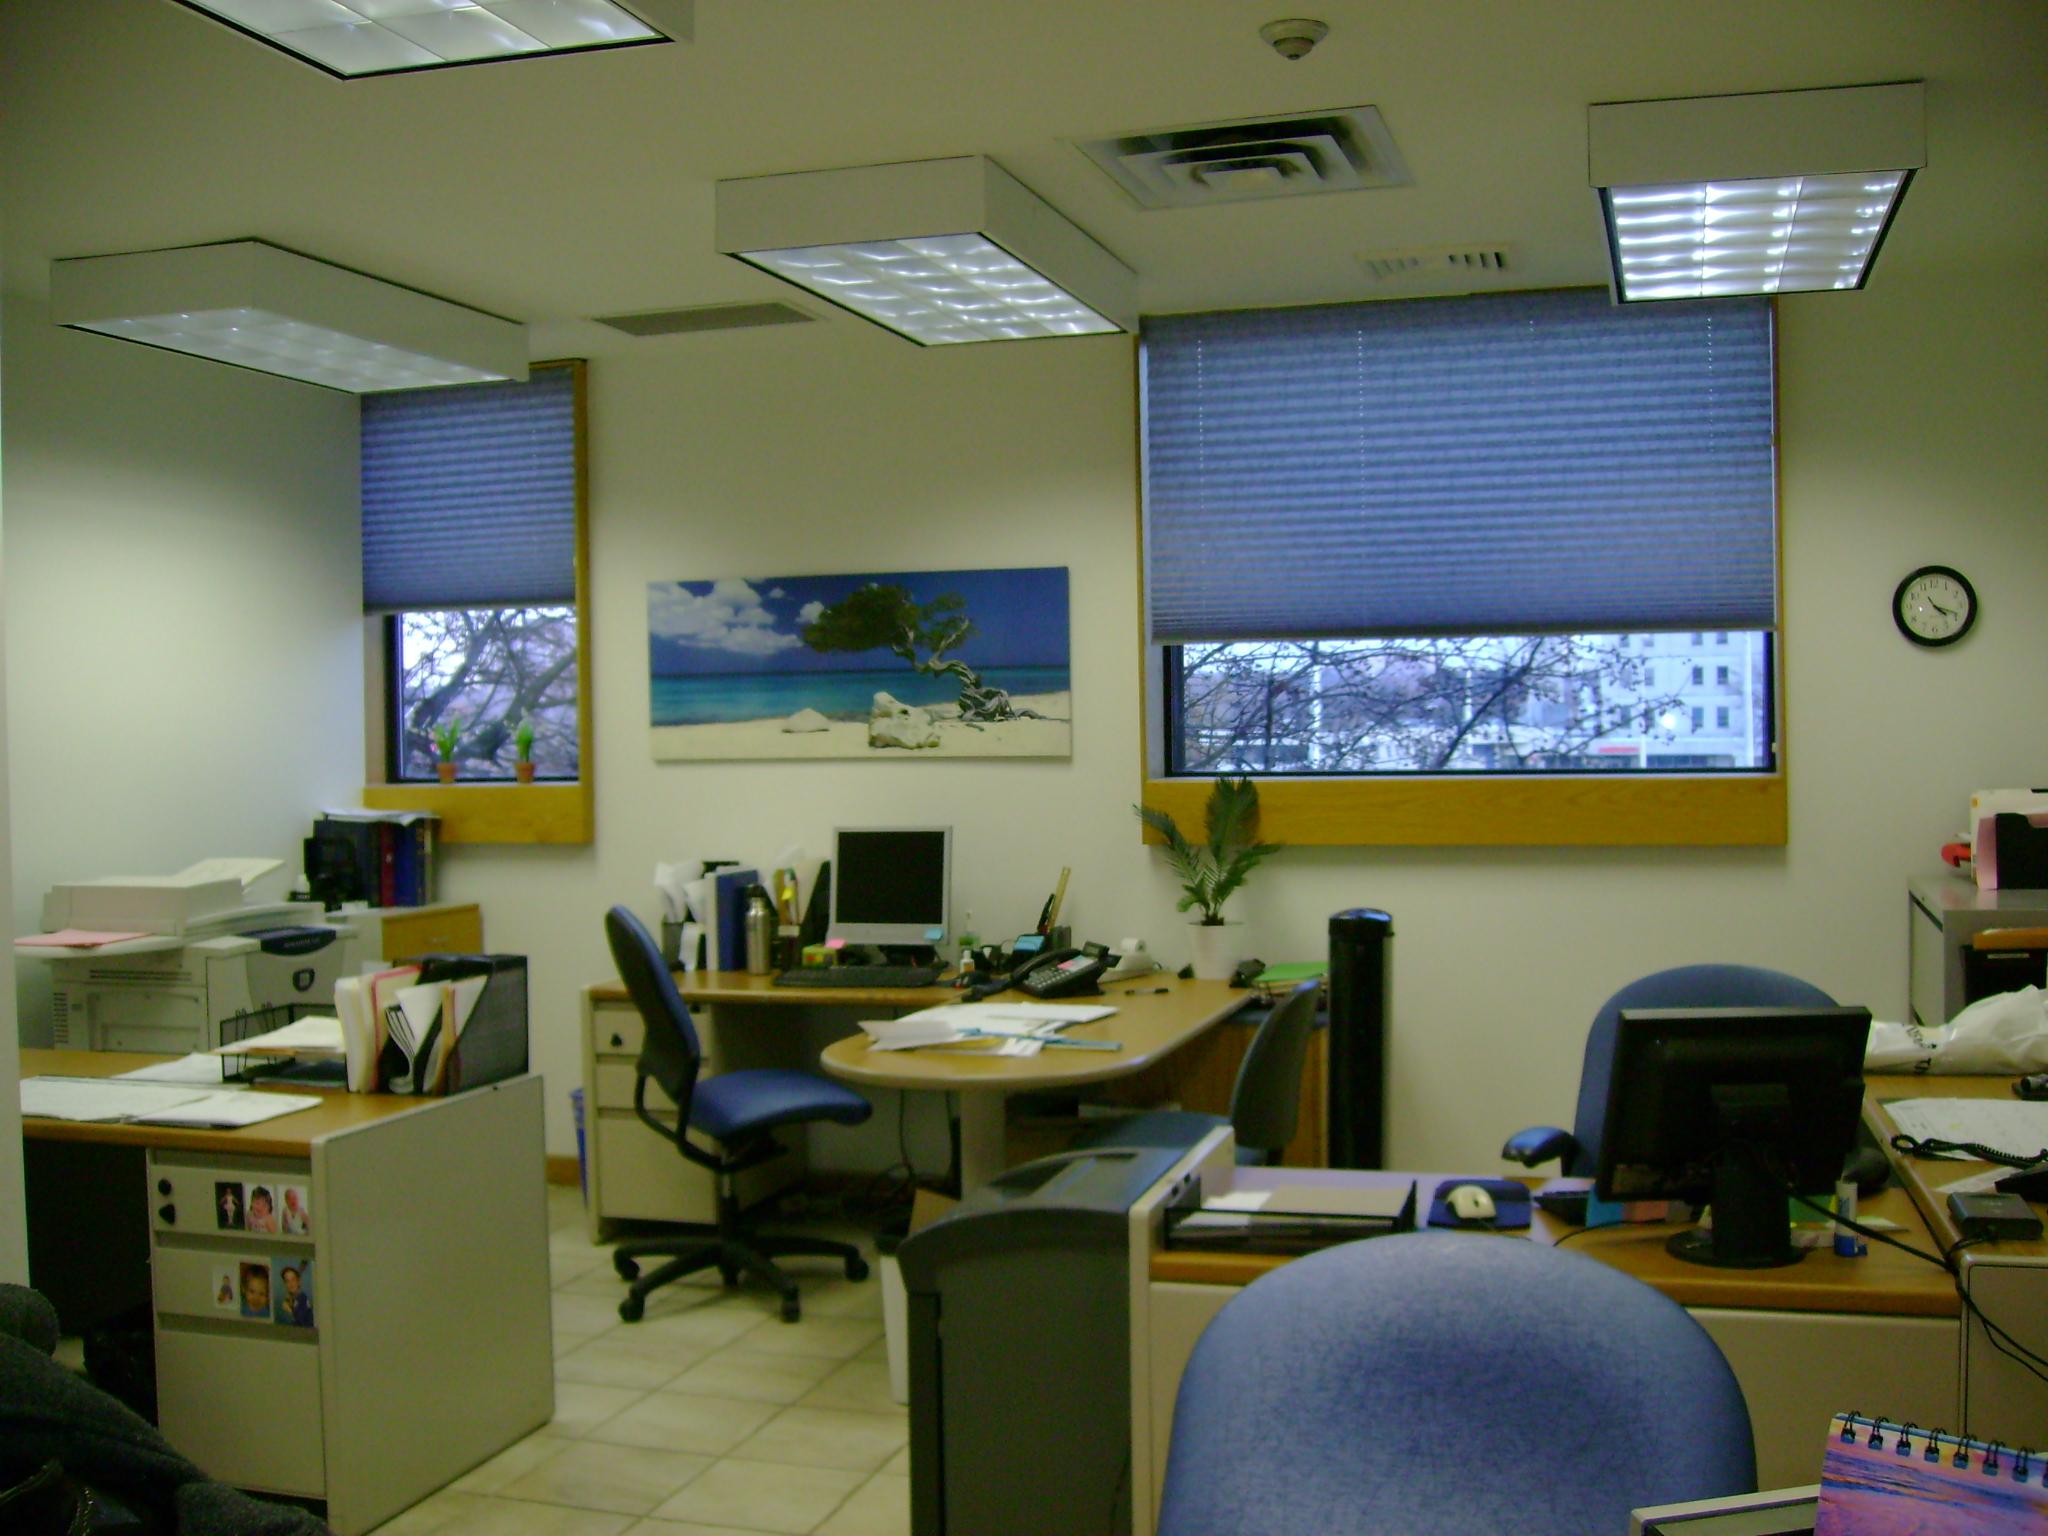 DoctorsOffice05.JPG